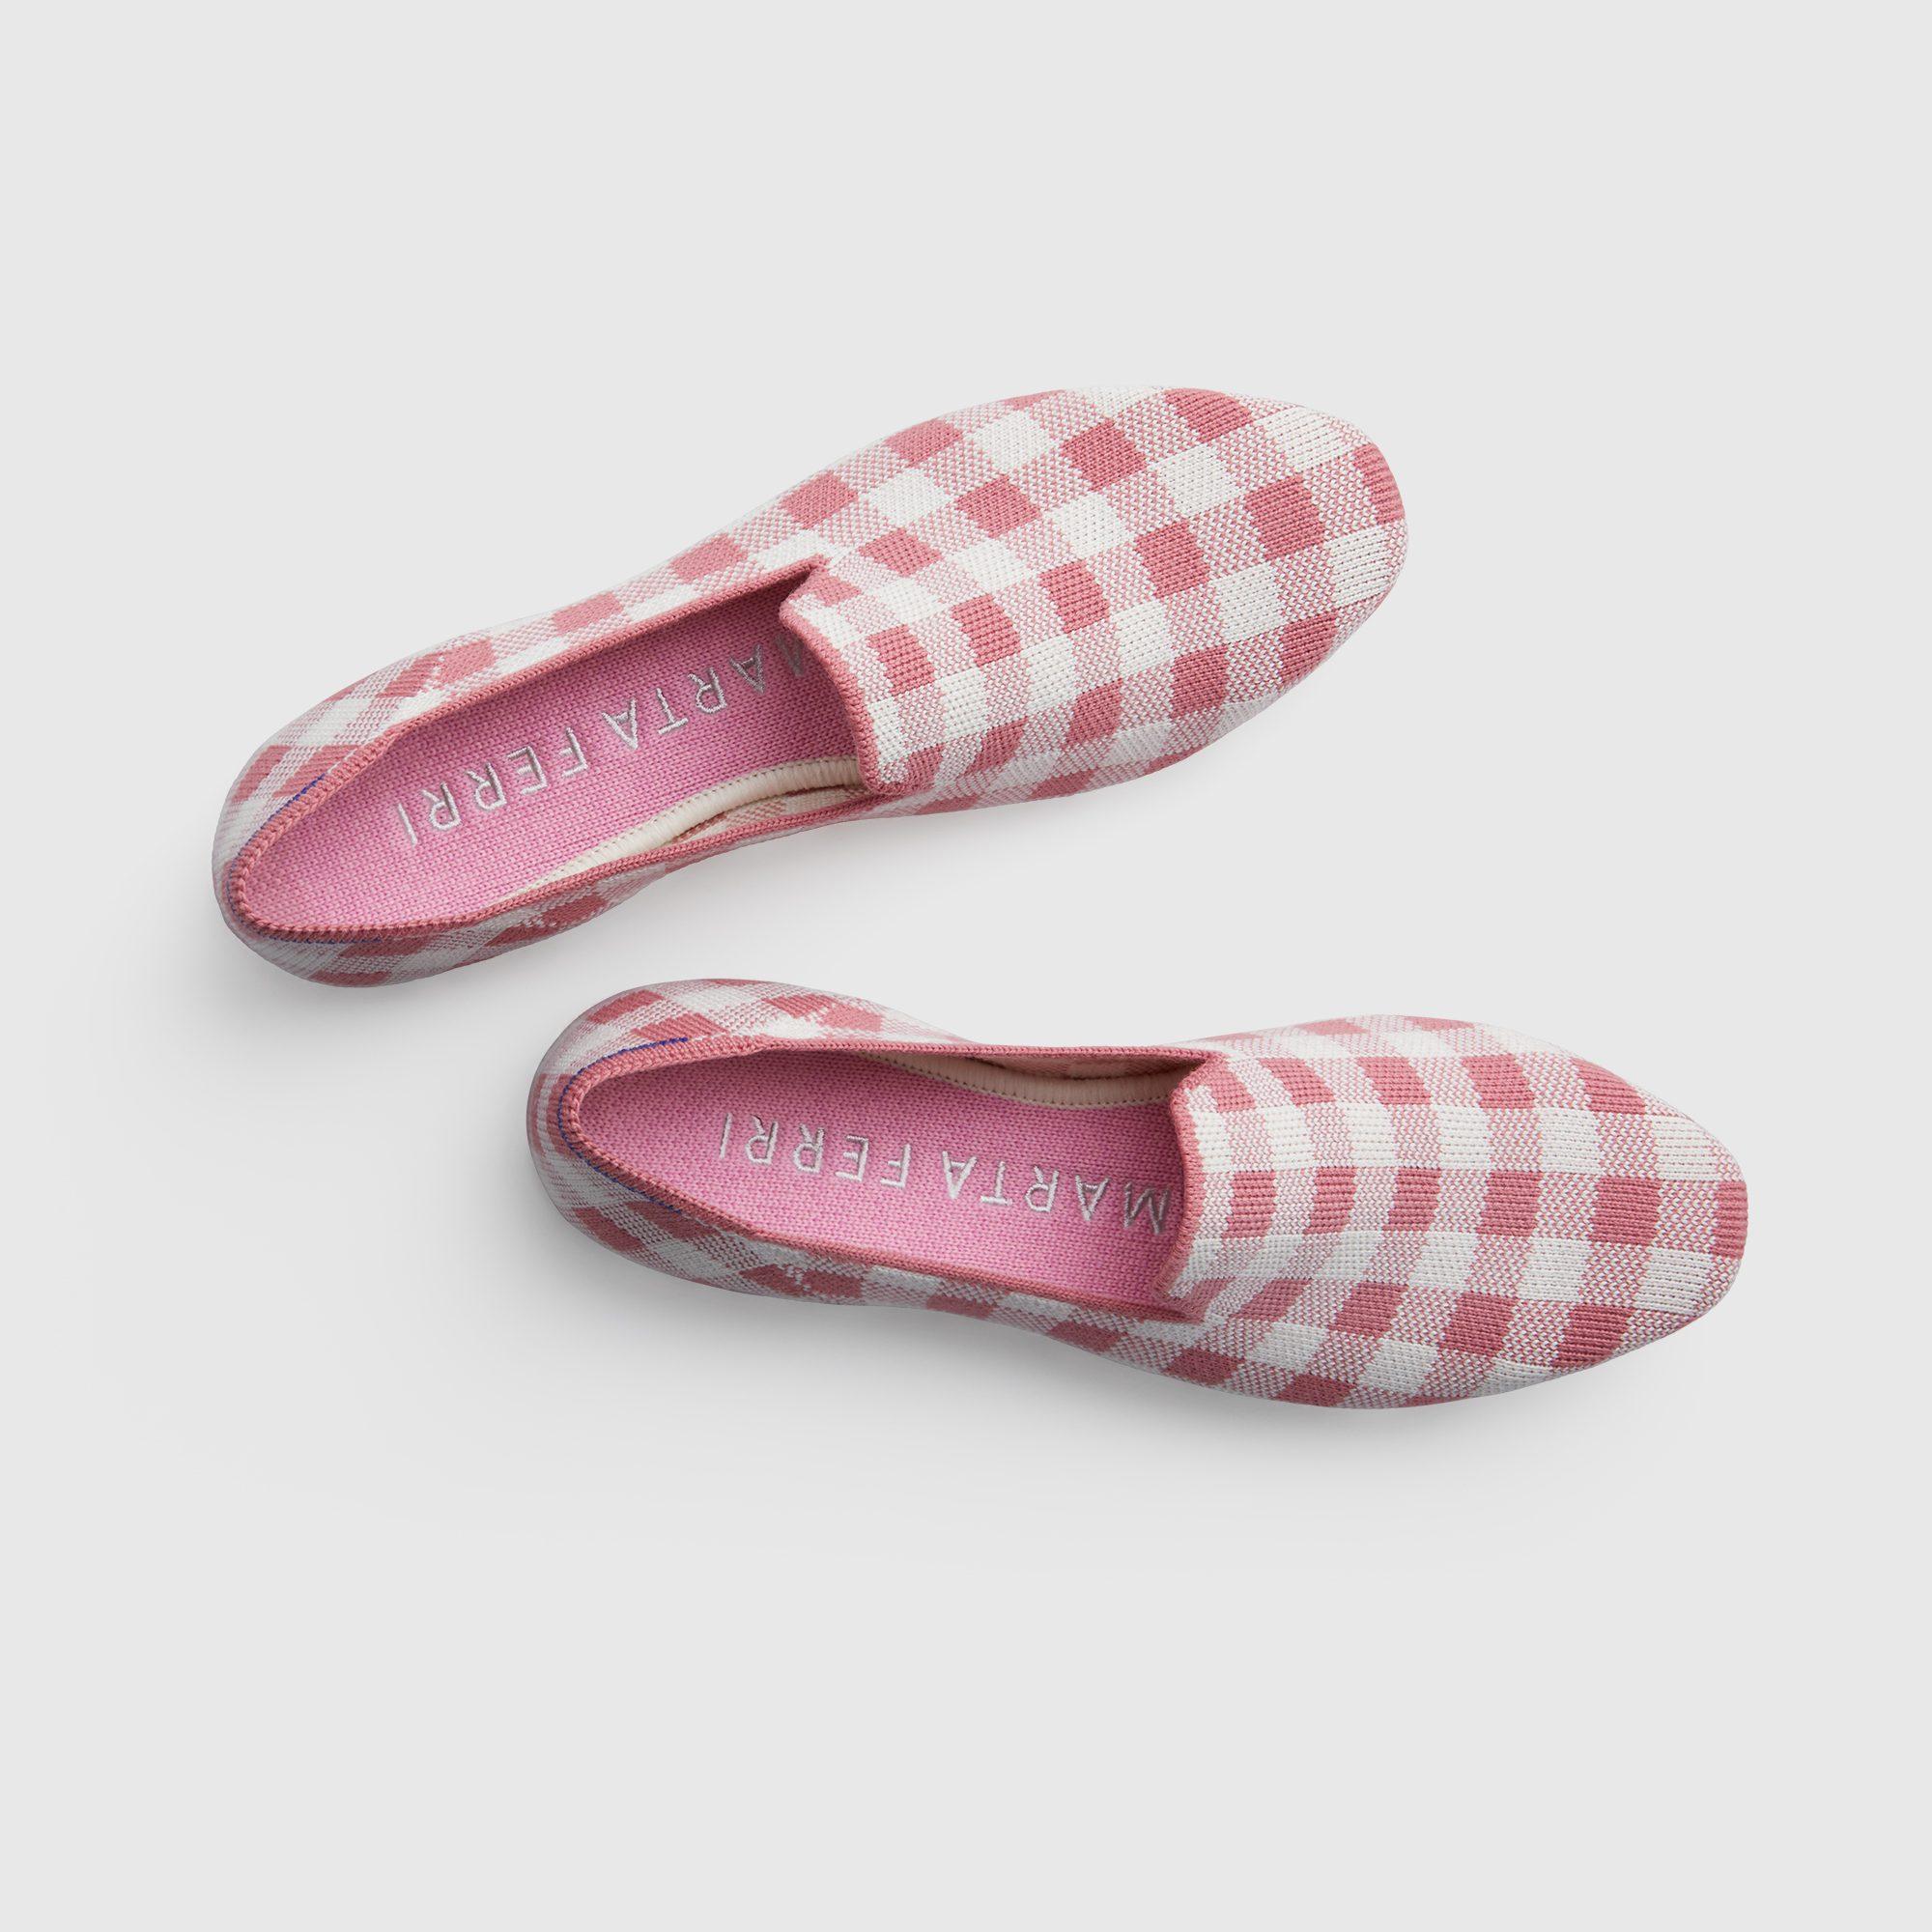 Marta Ferri x Rothy's Loafers